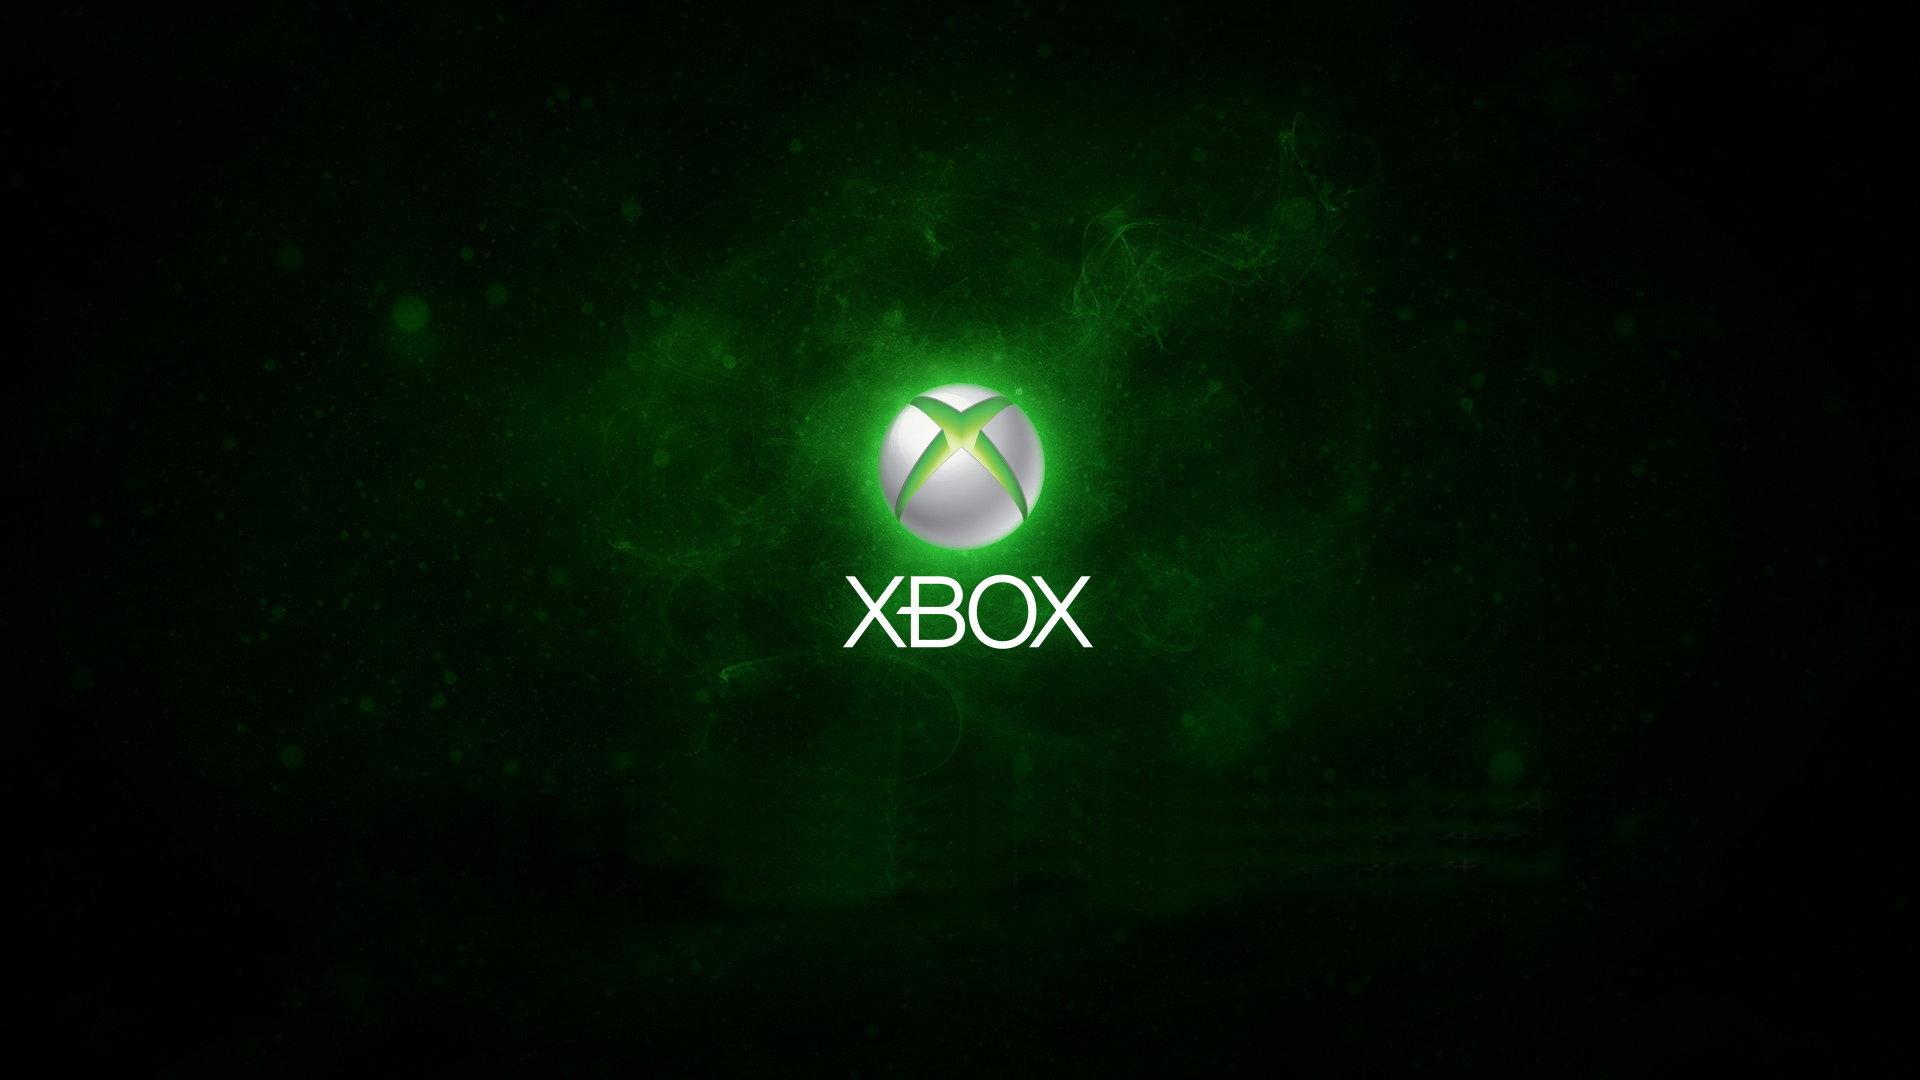 xbox one logo wallpaper - photo #14